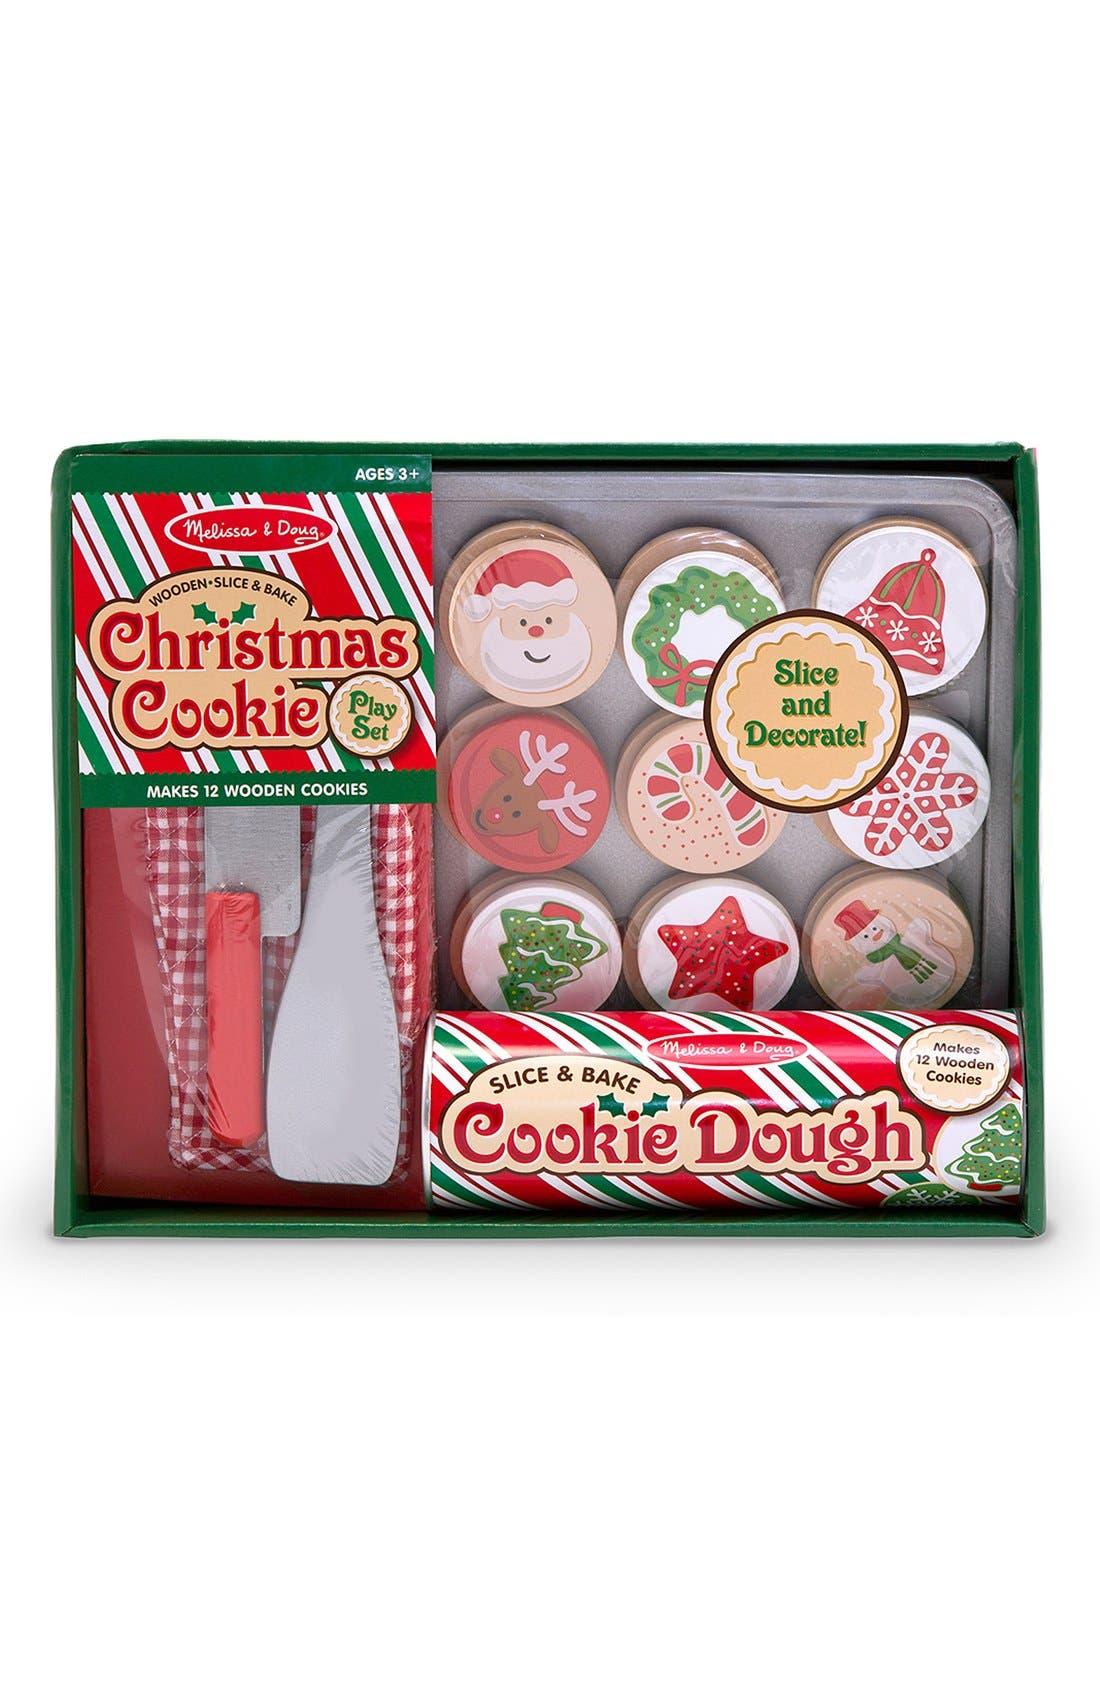 'Slice & Bake' Christmas Cookie Play Set,                             Main thumbnail 1, color,                             600